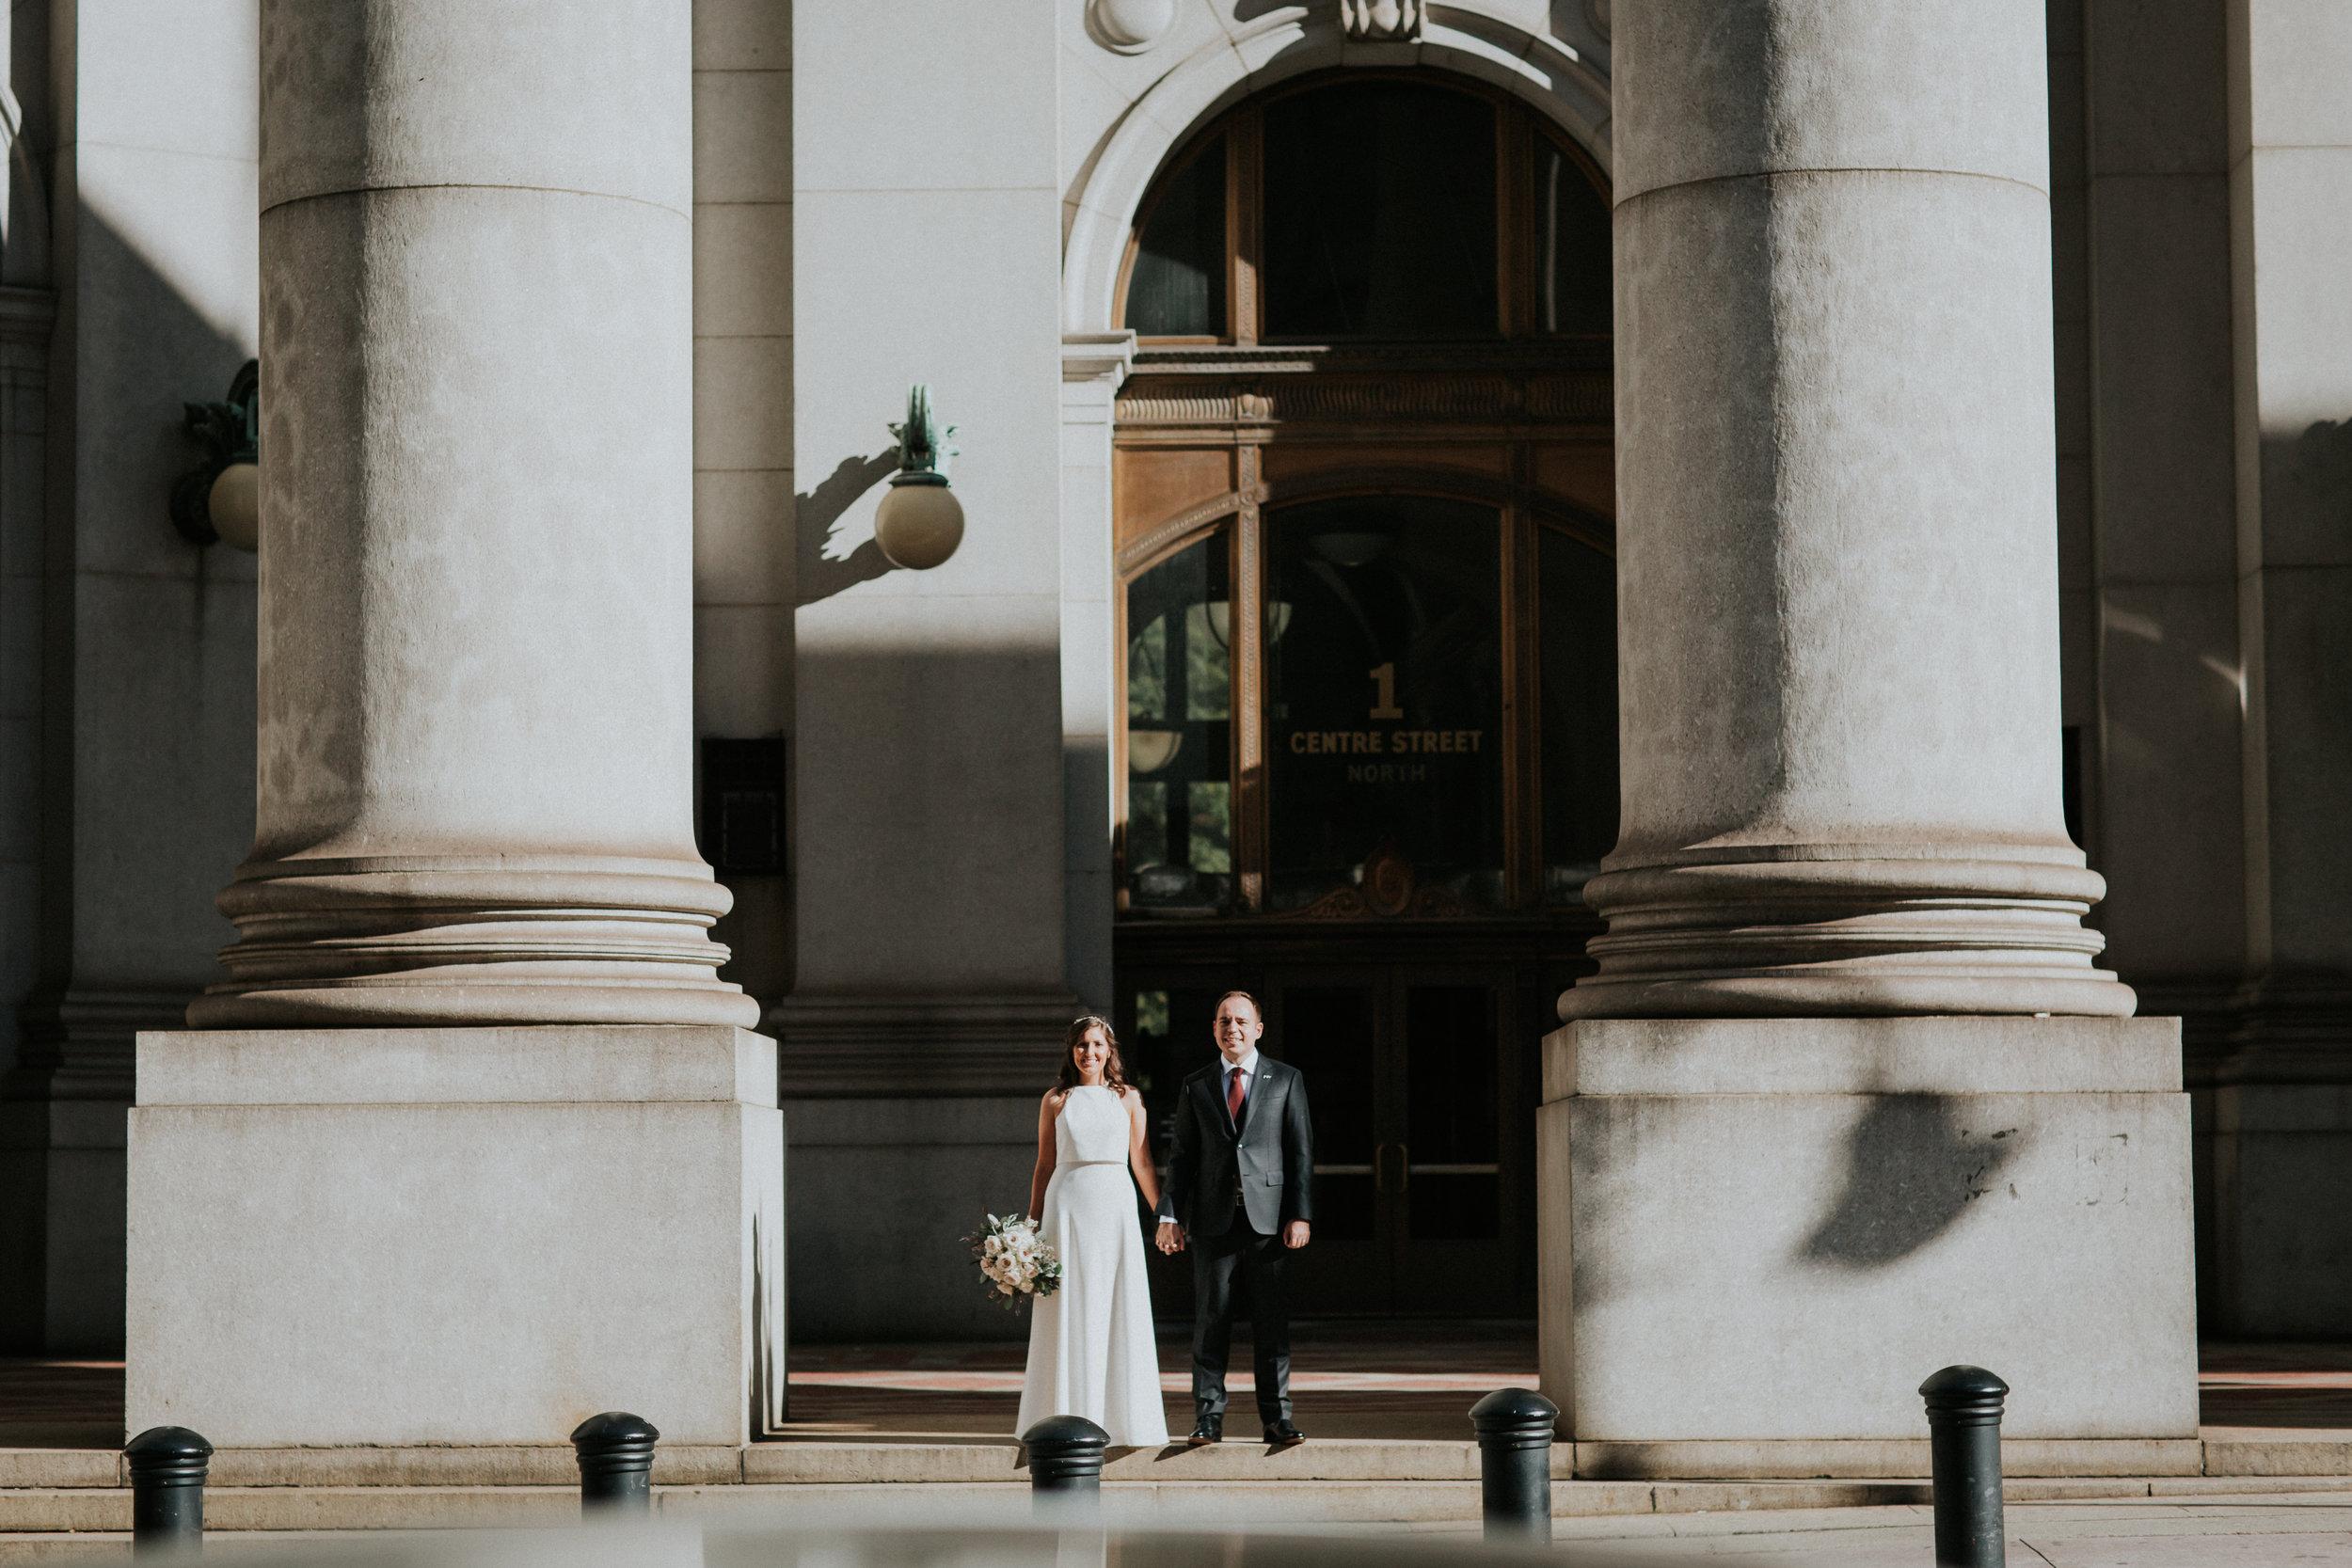 New-York-Documentary-Wedding-Photography-Best-Of-2017-by-Elvira-Kalviste-Photography-112.jpg